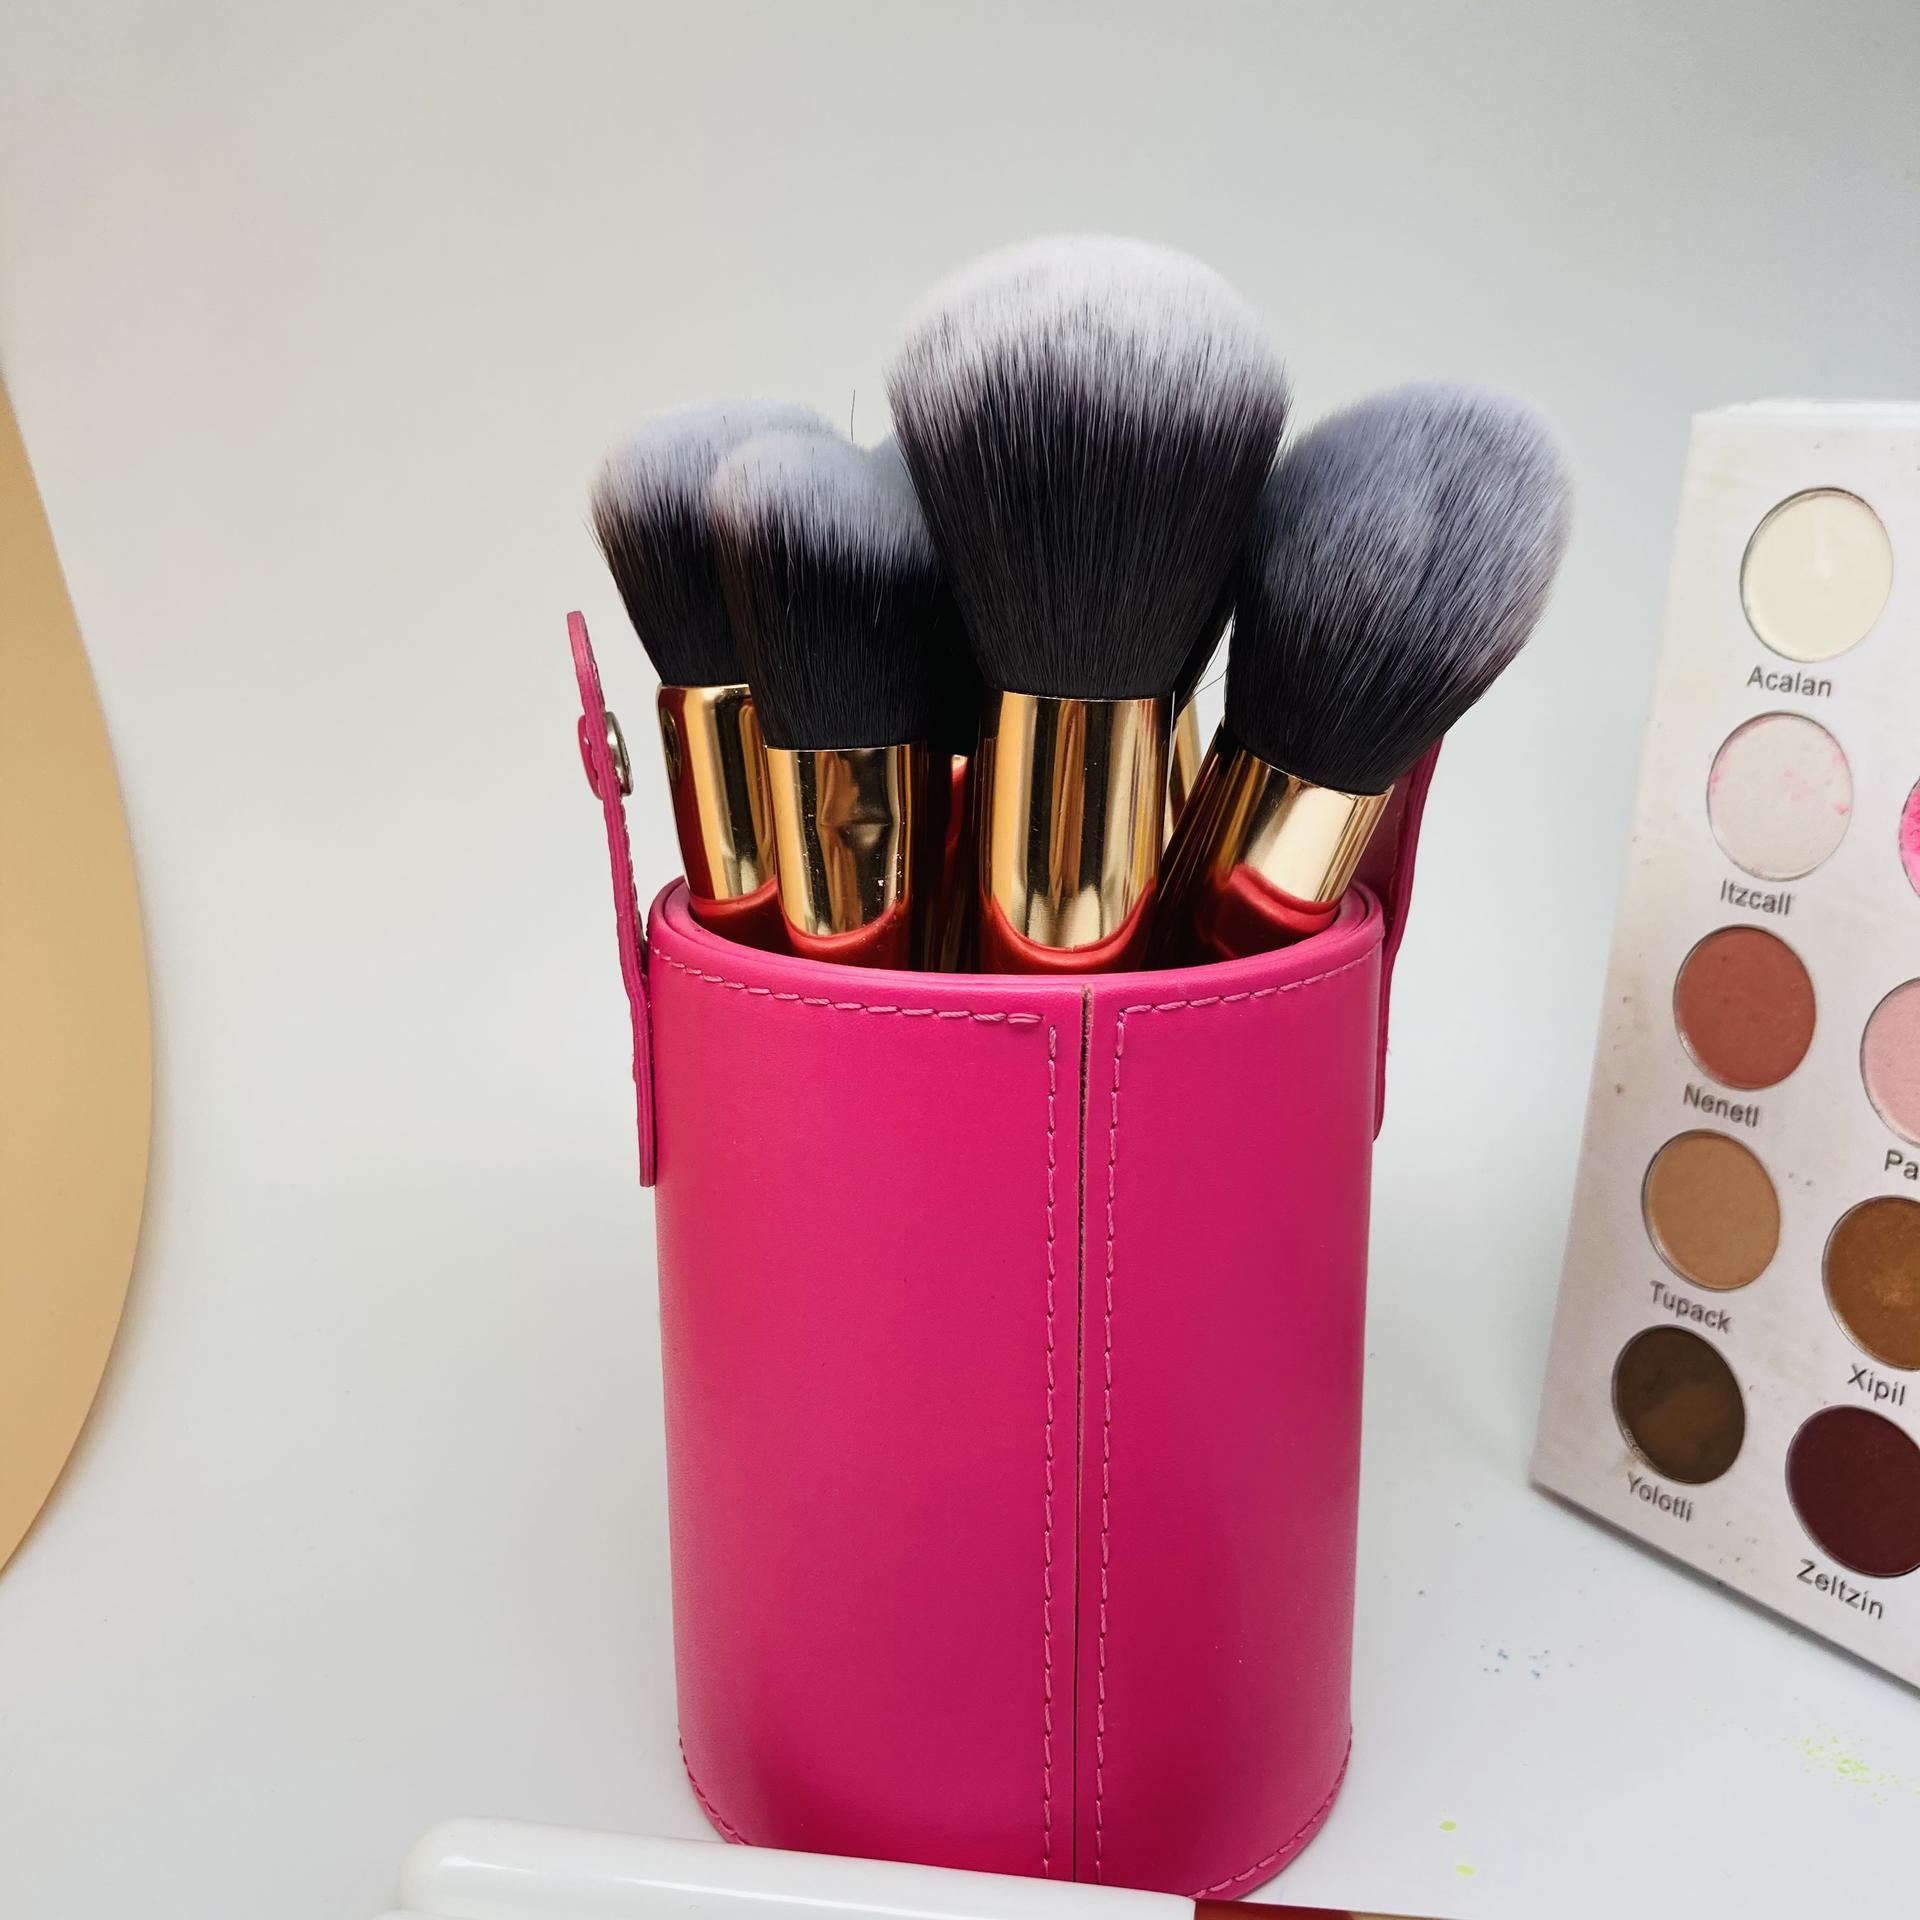 Wholesale makeup brush set Suprabeauty private label professional vegan makeup brush set